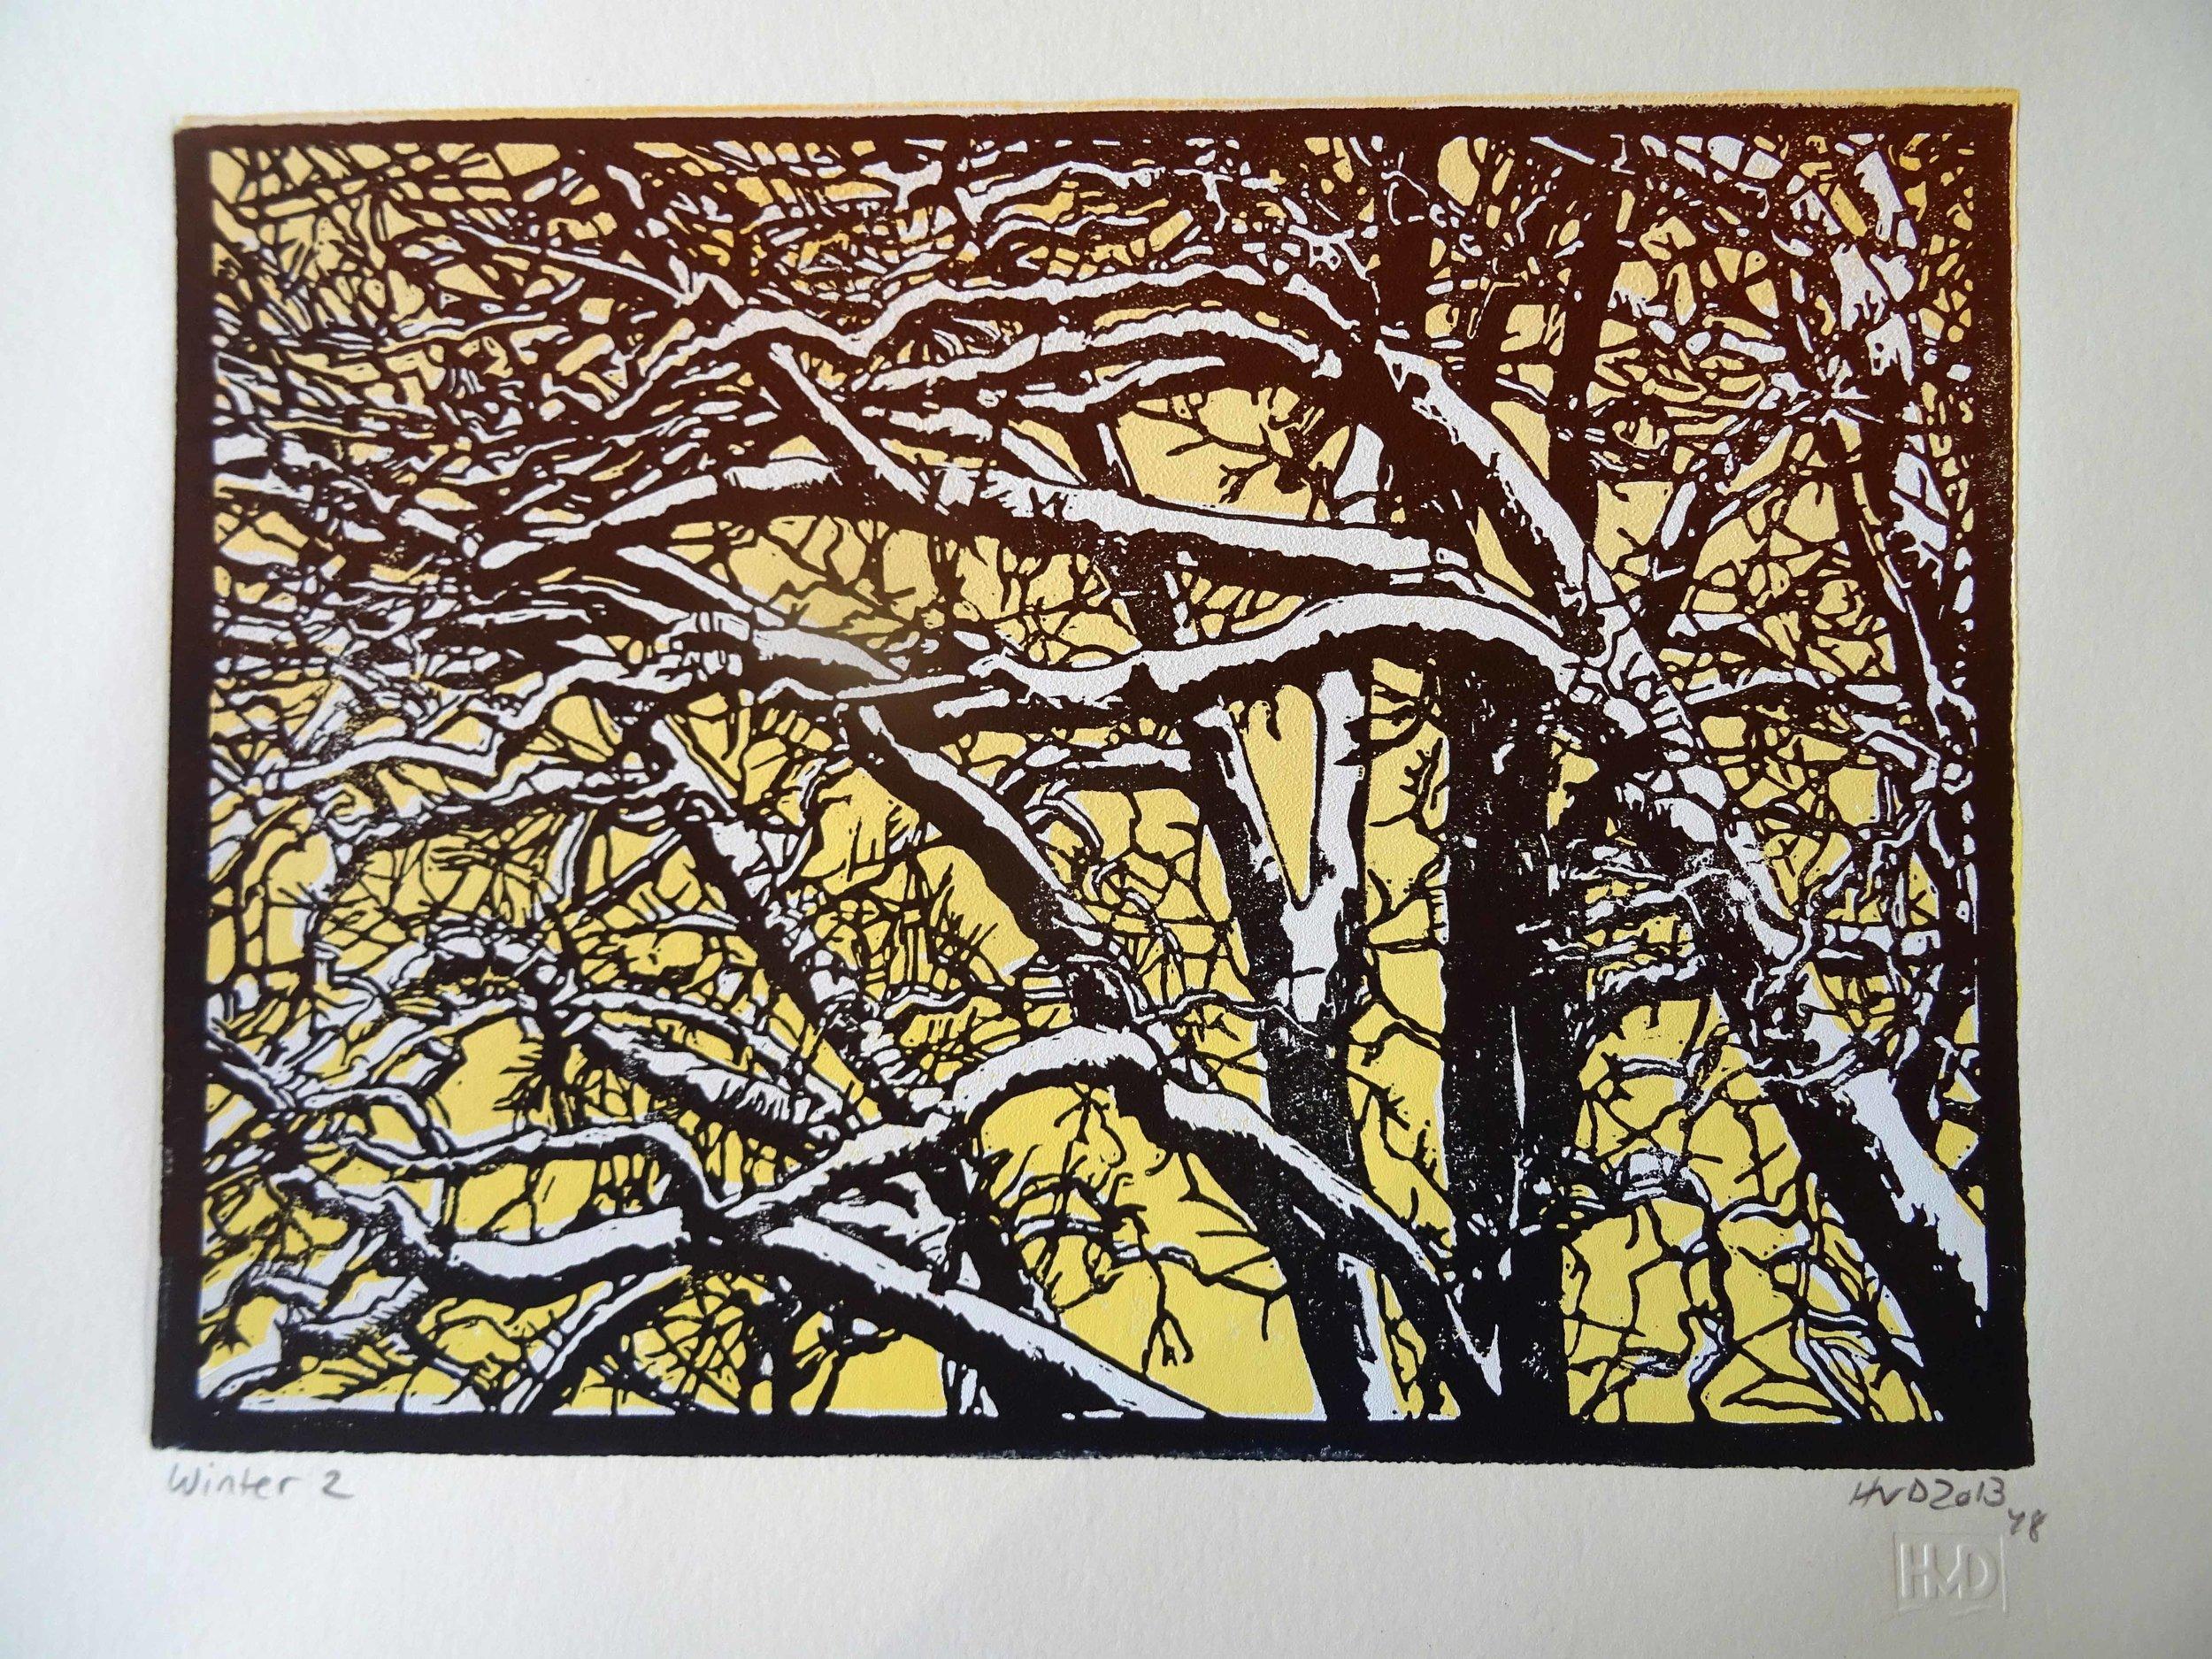 135-6, winter trees, 21x30 cm, 3-plate lino, 80 €